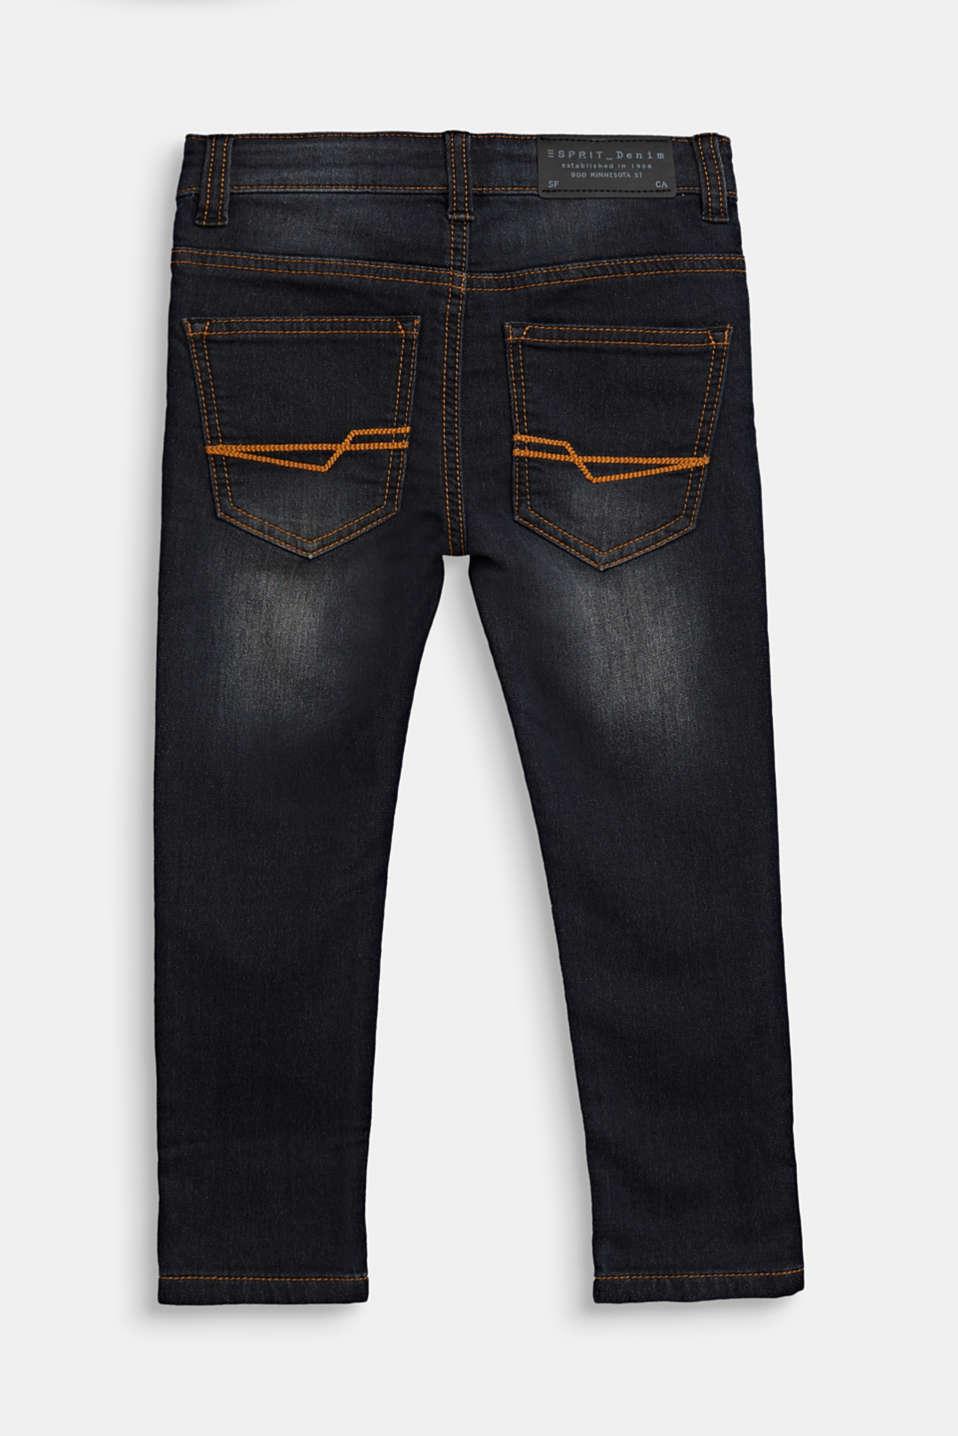 Jeans in comfy tracksuit fabric, adjustable waistband, BLACK DENIM, detail image number 1